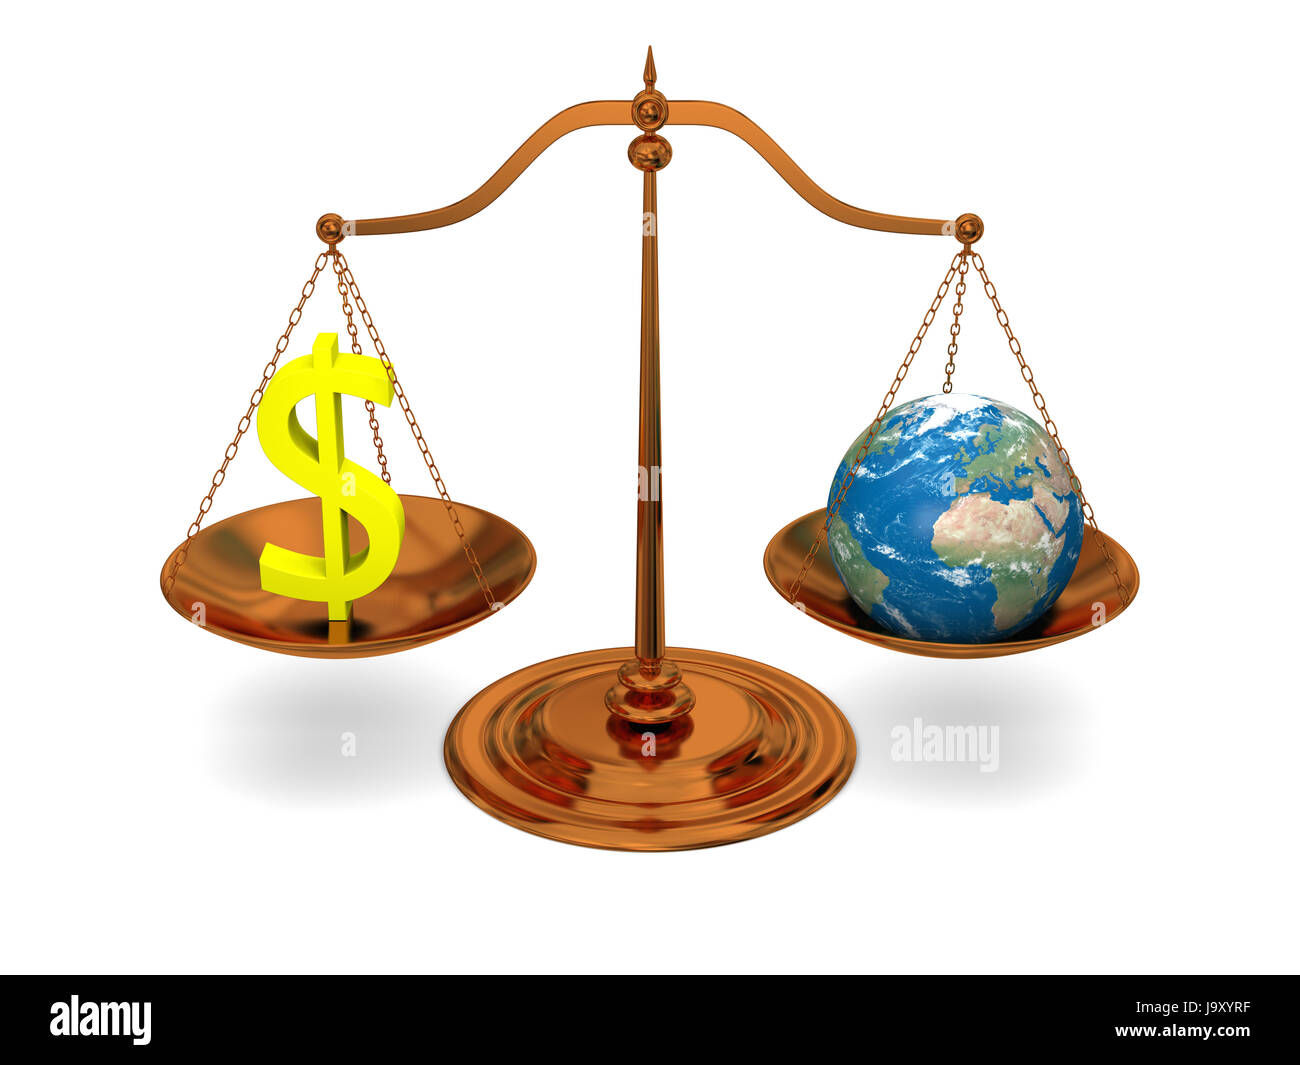 bribery, corruption, extortion, dollar, dollars, isolated, model, design, Stock Photo